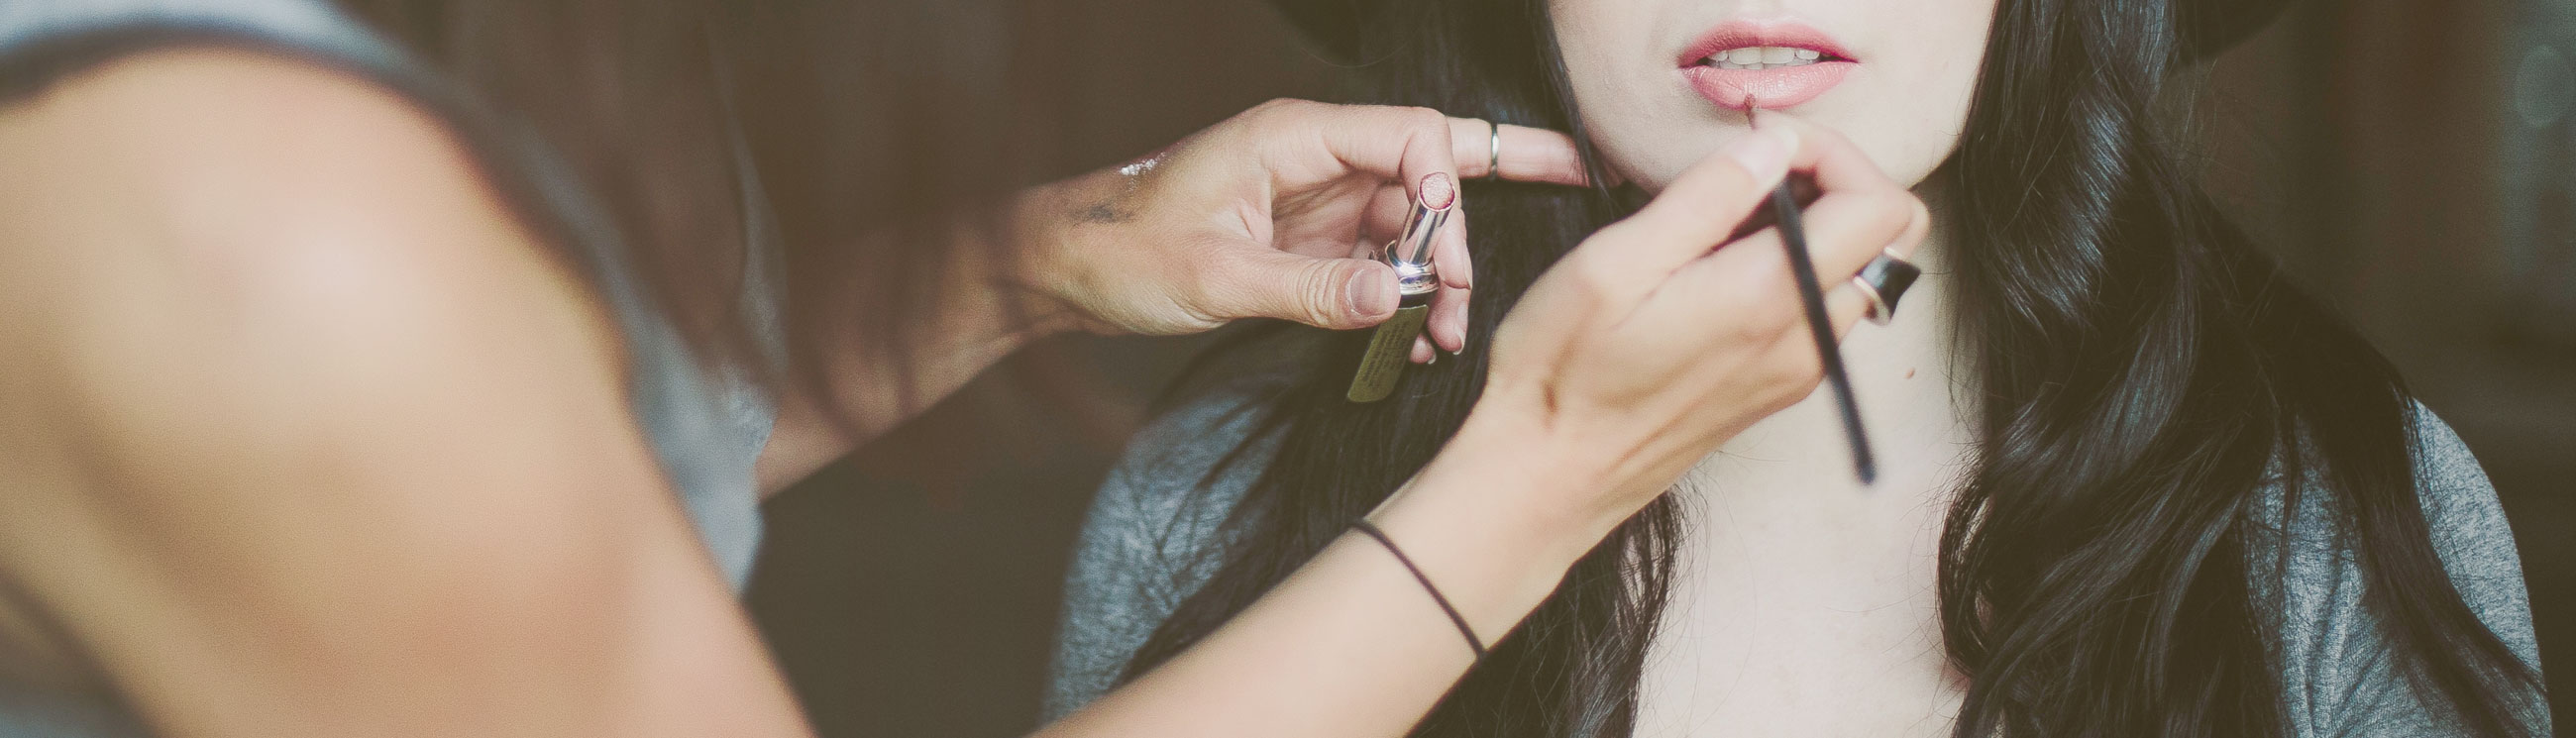 Maquillage - Témoignages